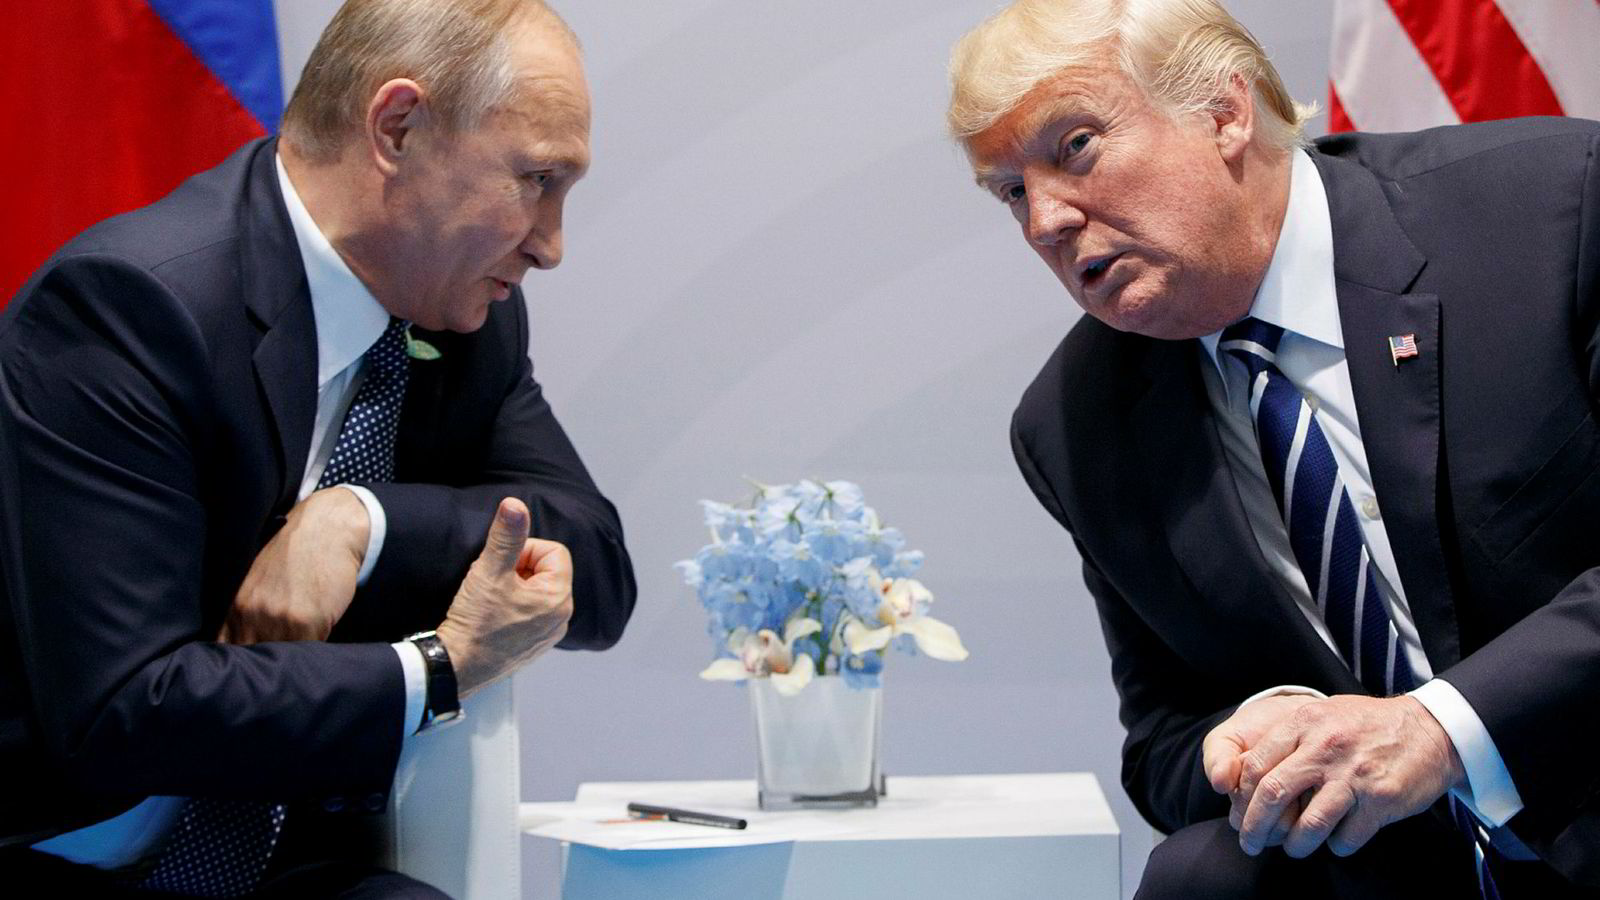 Vladimir Putin og Donald Trump under G20-møtet i Hamburg.